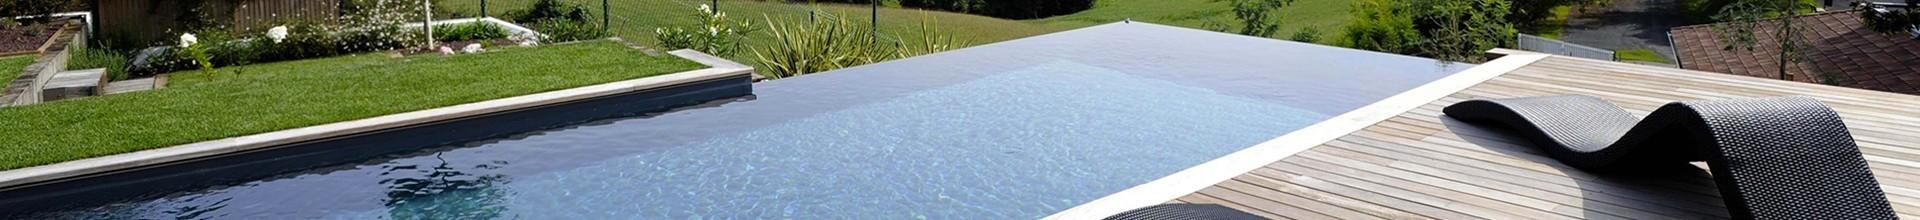 Direct usine, piscine coque prix Alost